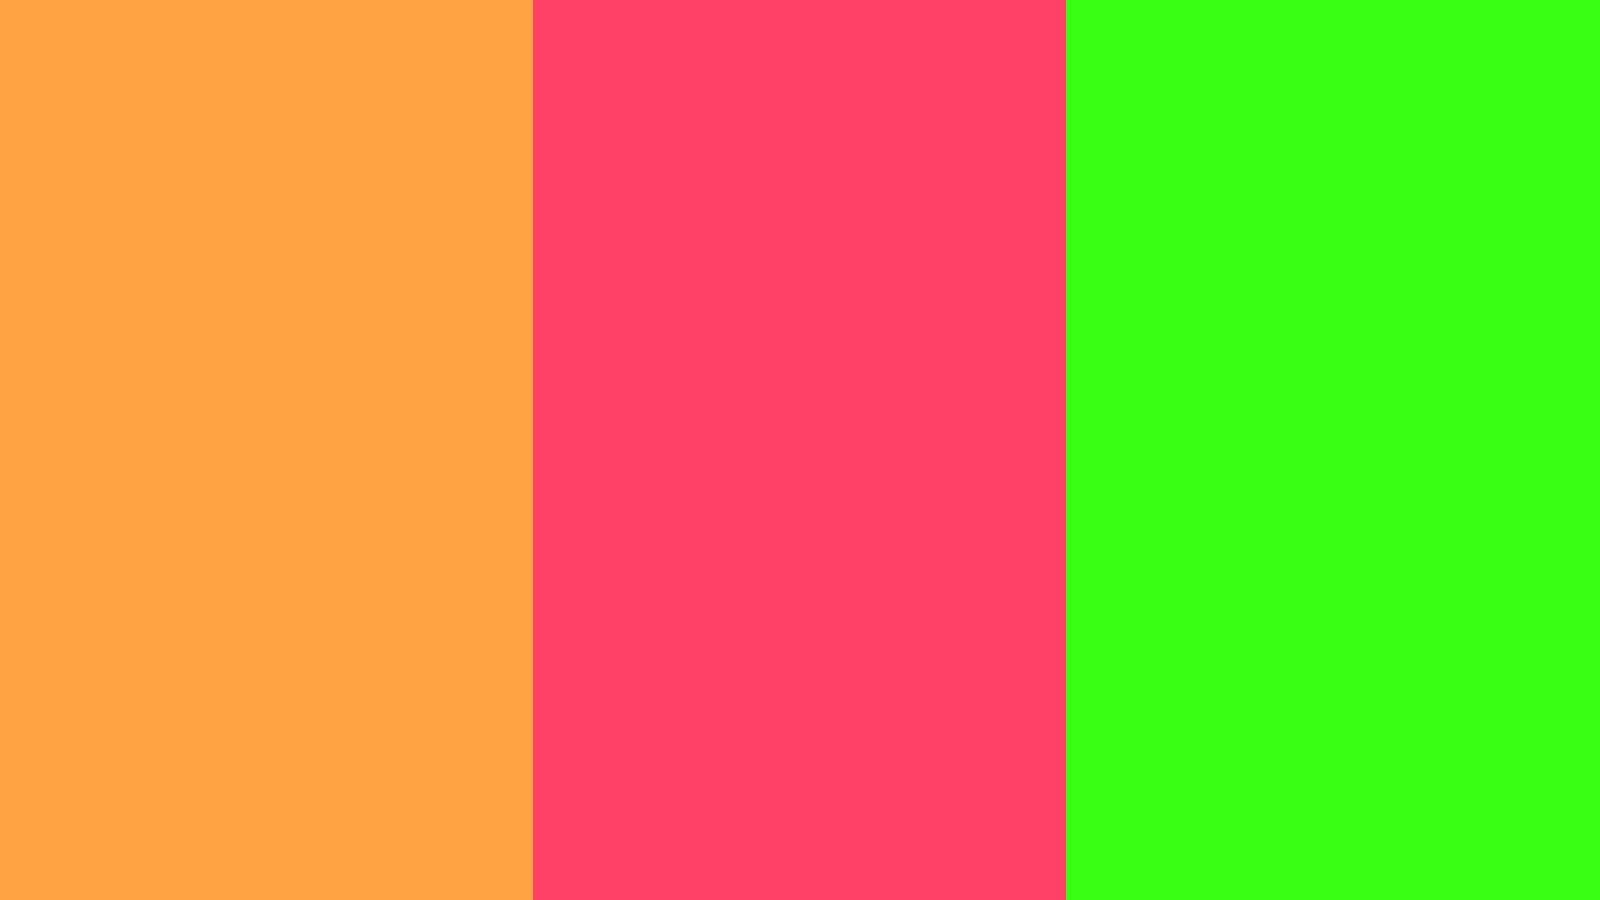 Neon Carrot Fuchsia Green Three Color Backgroundjpg 1600x900